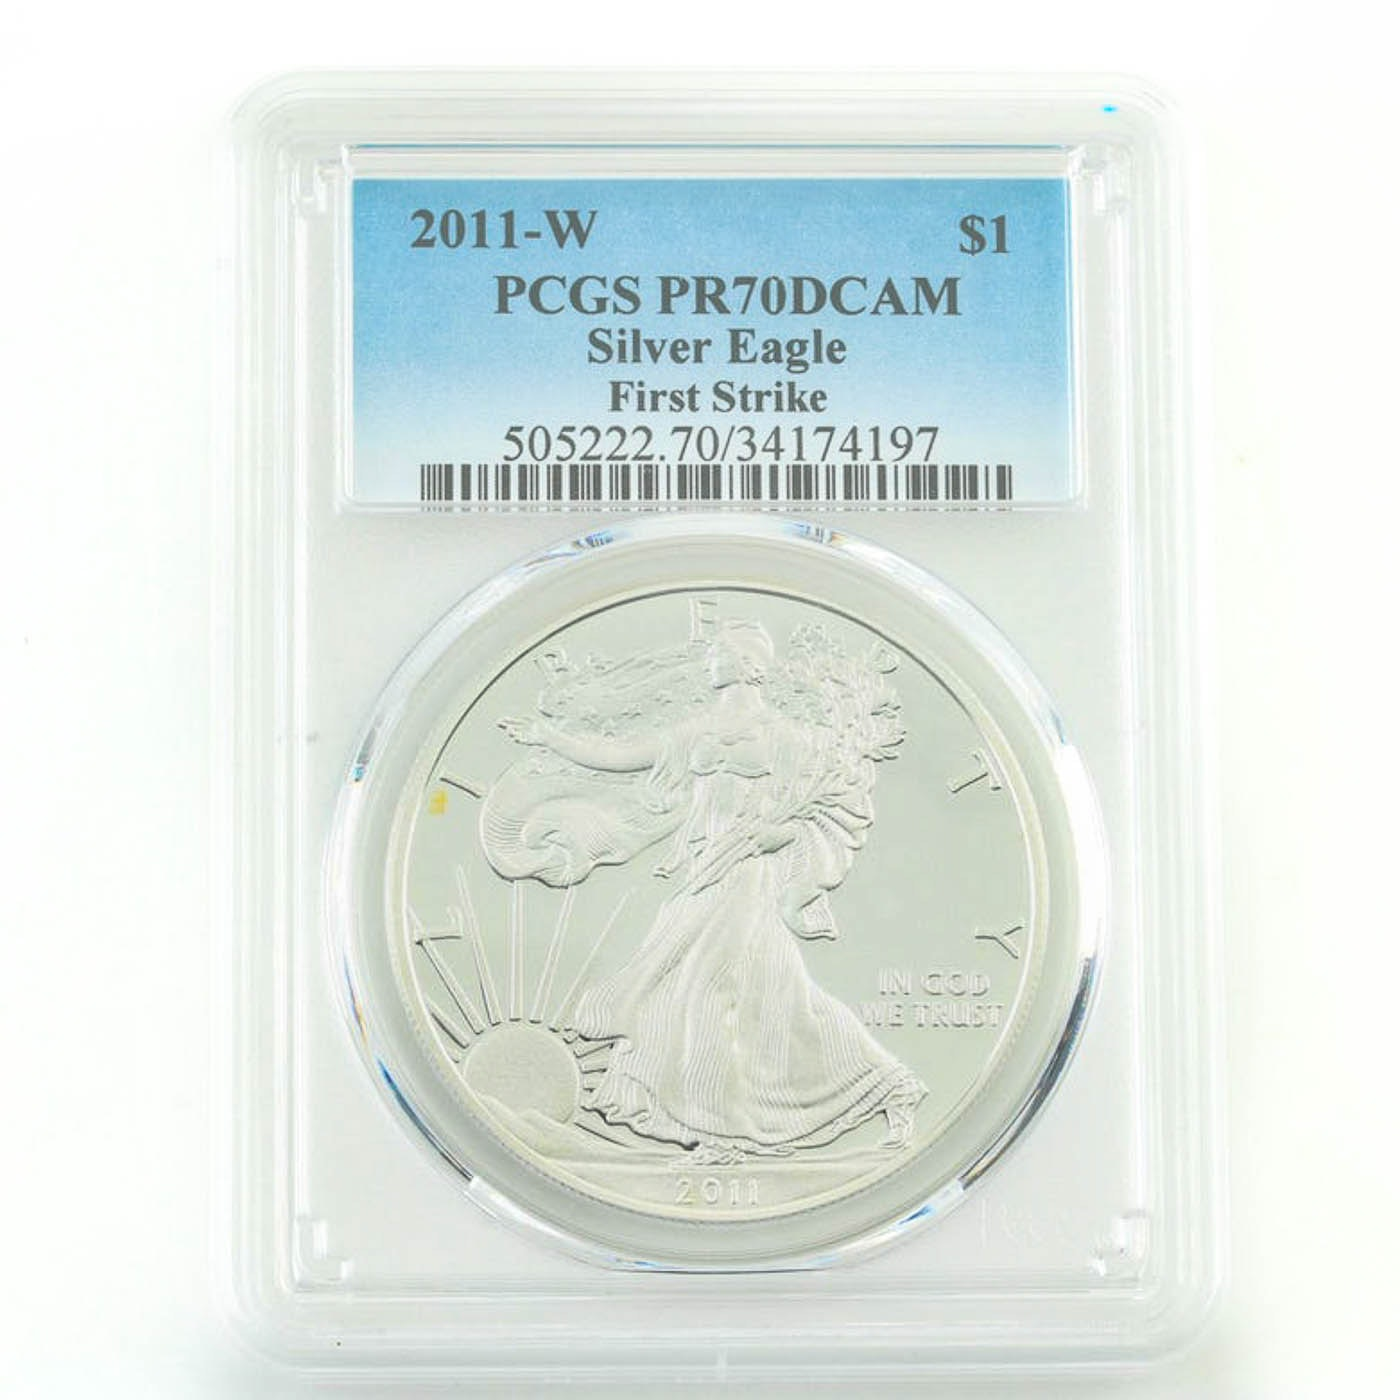 PCGS Graded PR70DCAM 2011-W Silver Eagle First Strike Bullion Coin